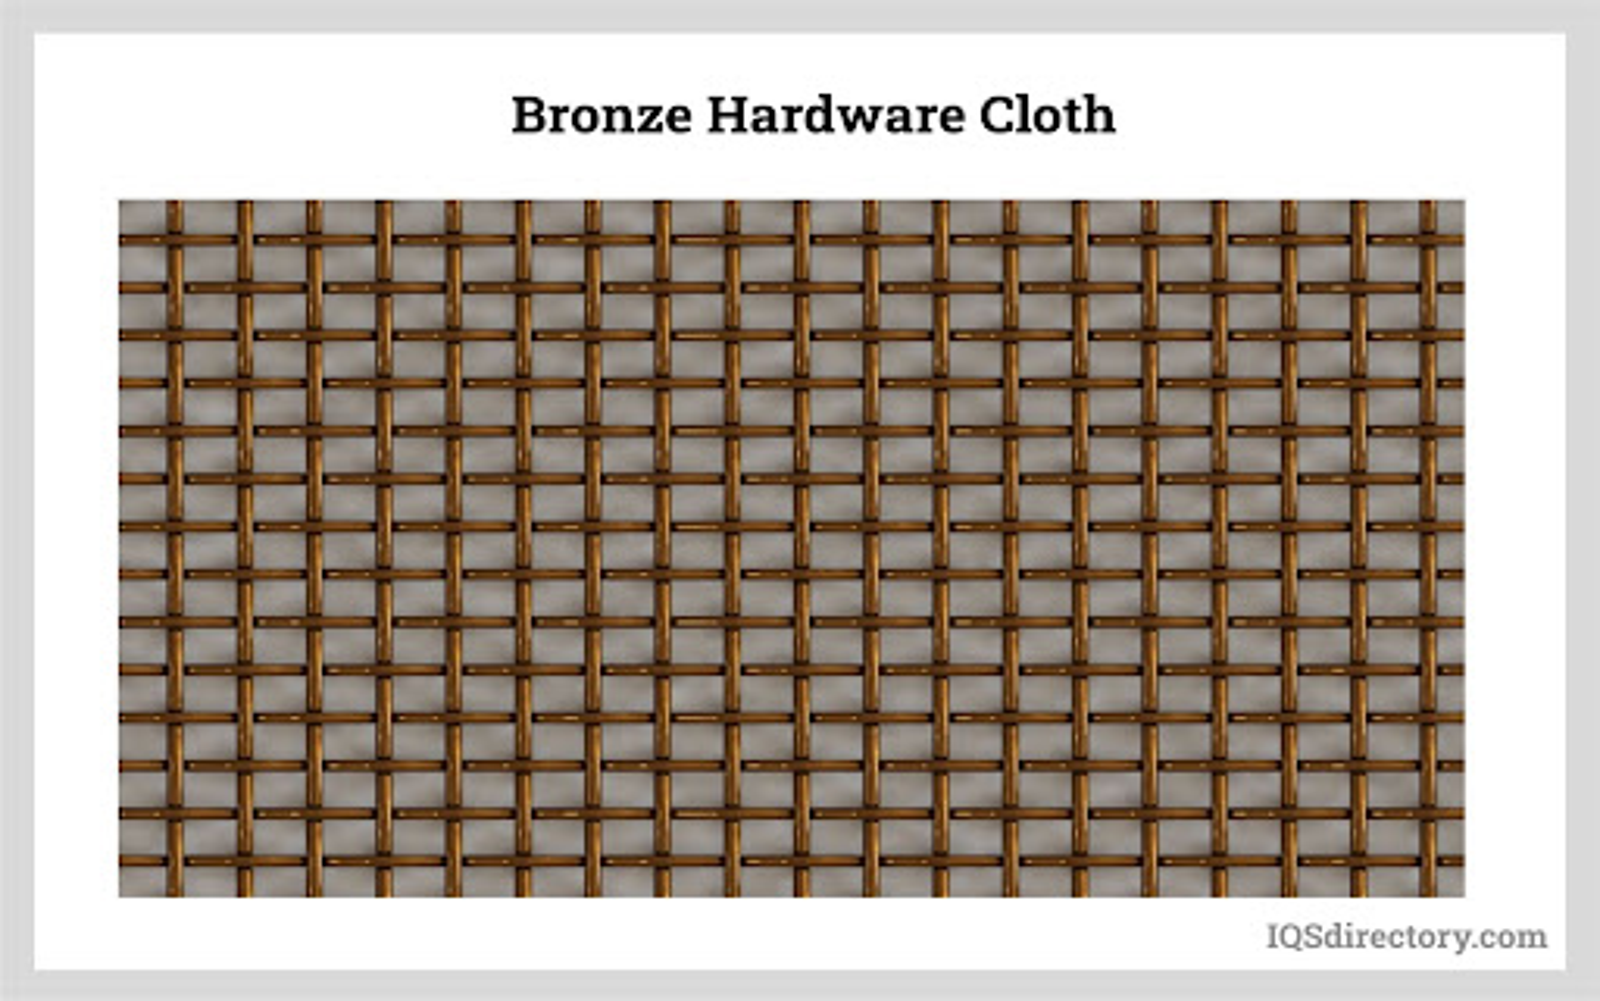 Bronze Hardware Cloth